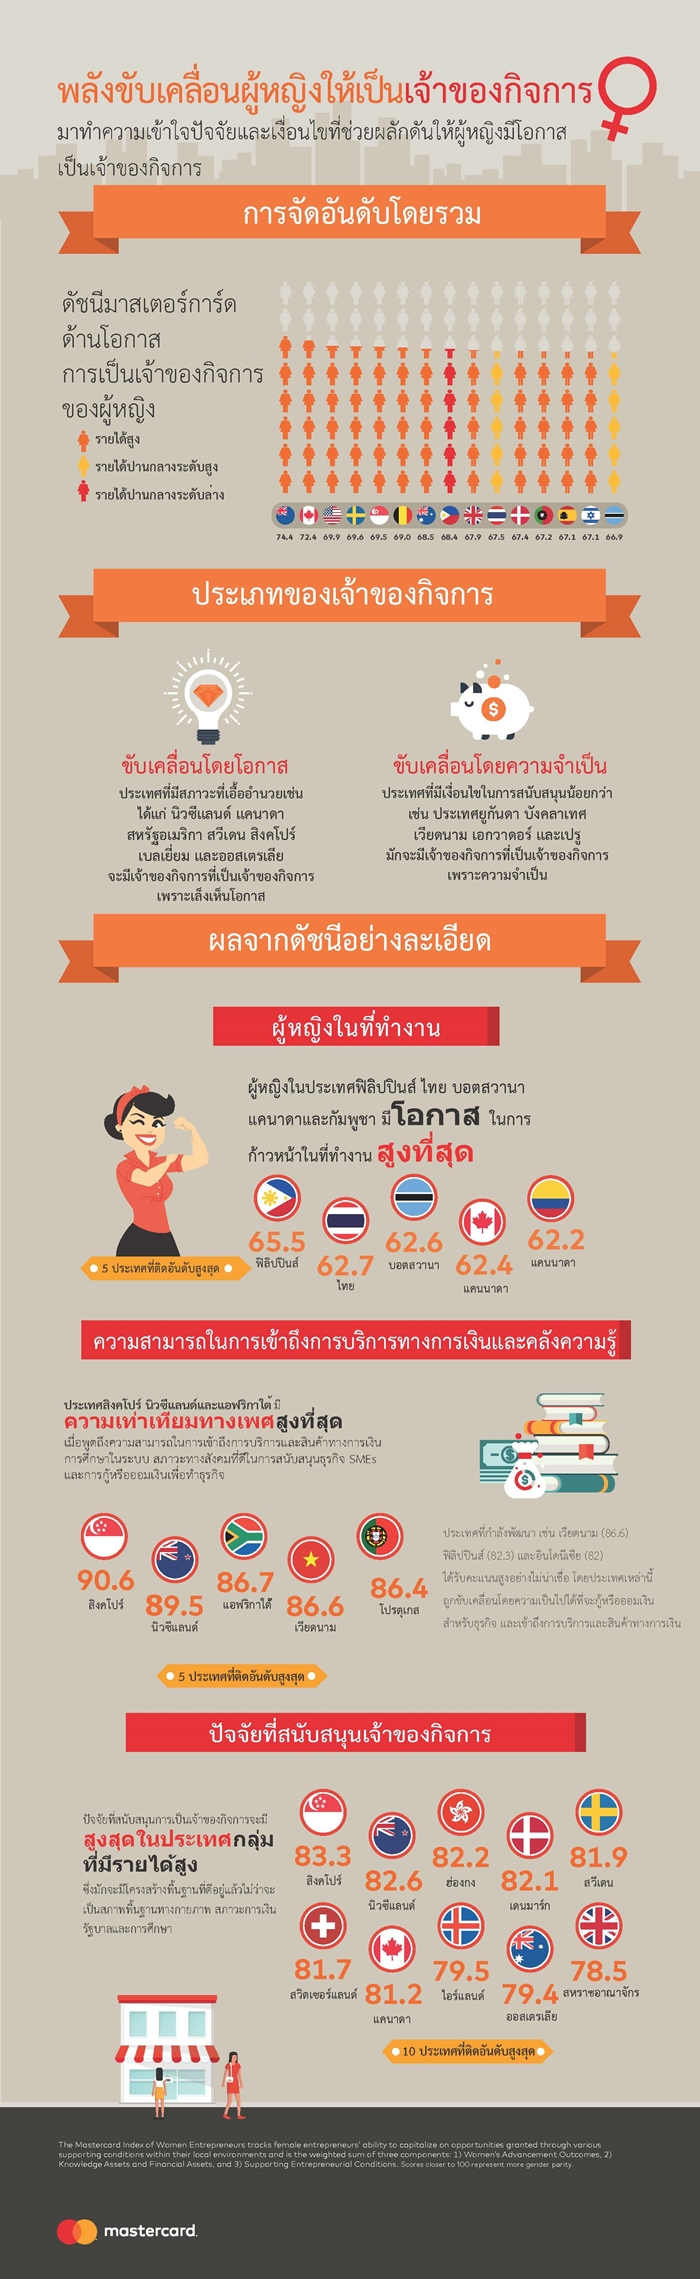 Infographic - Mastercard Index of Women Entrepreneurs 2017_TH-700